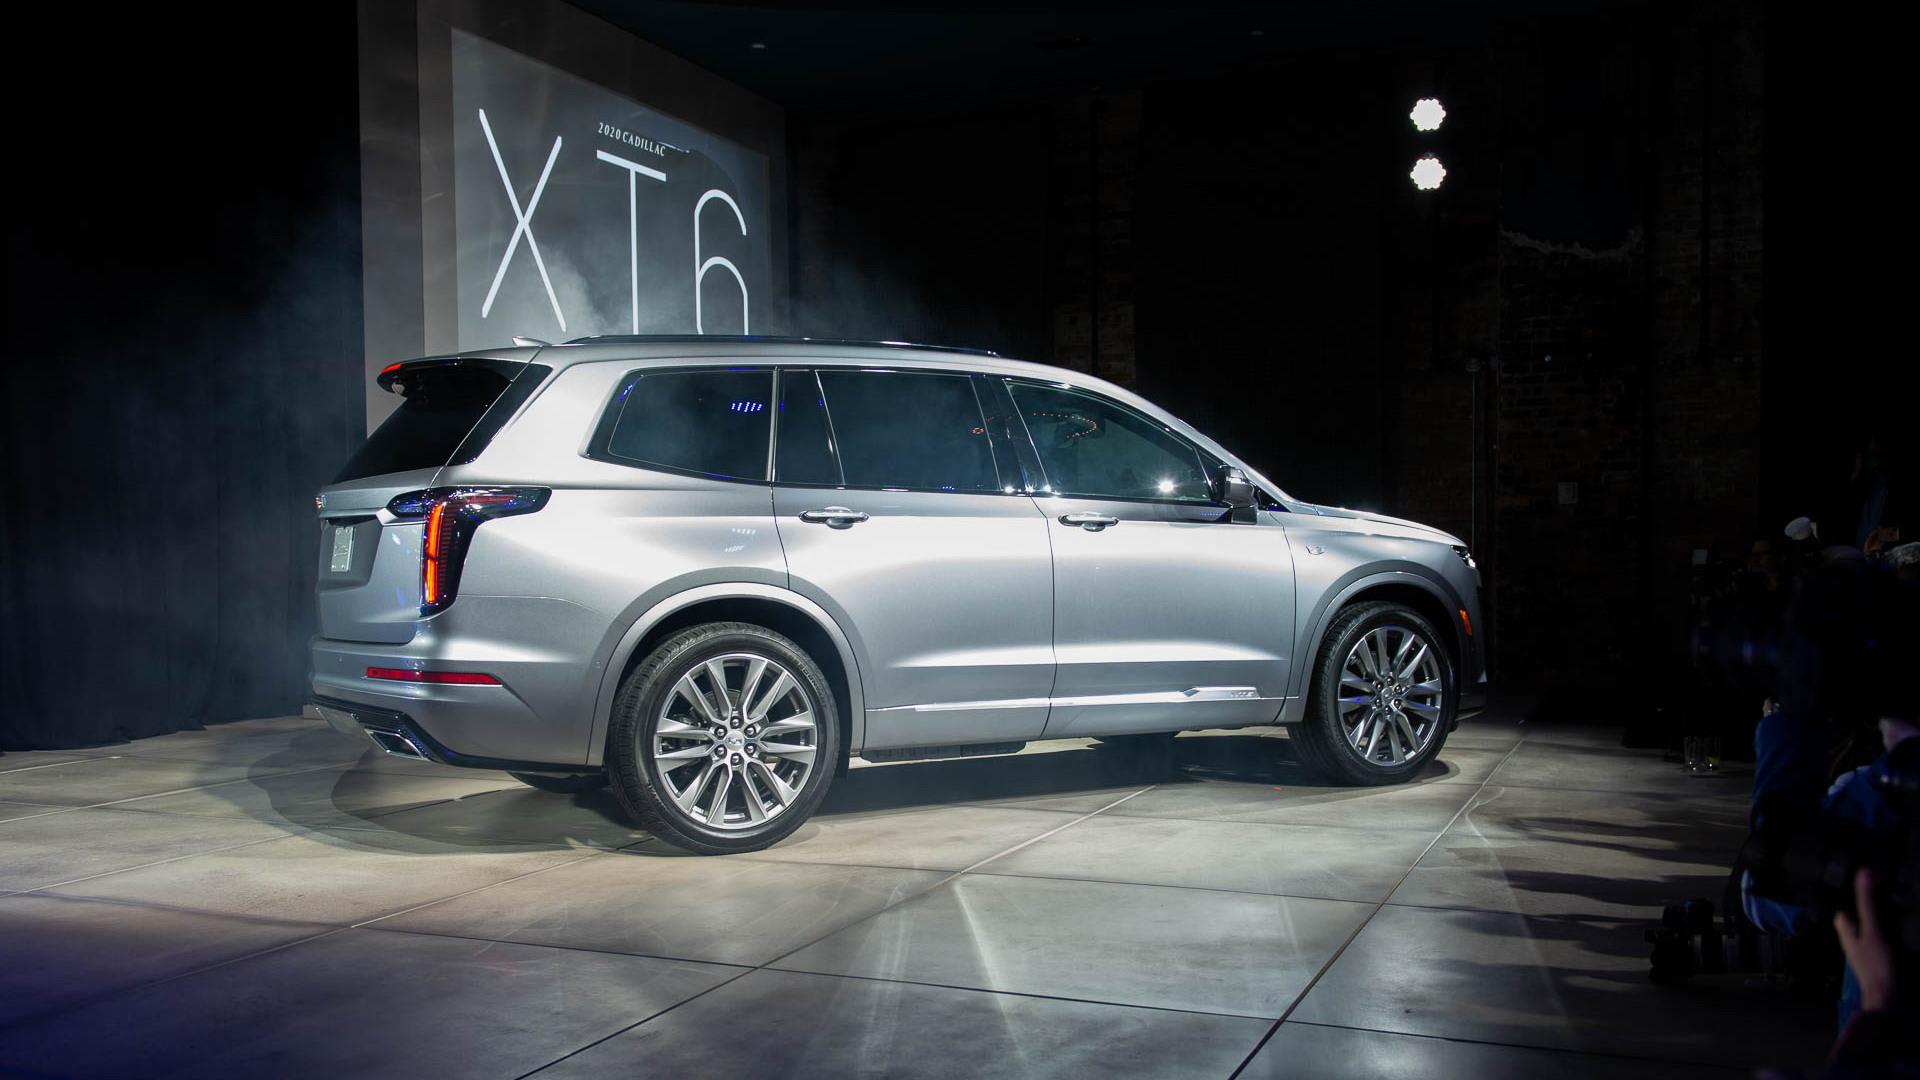 2020 Cadillac XT6 luxury three-row crossover first look ...